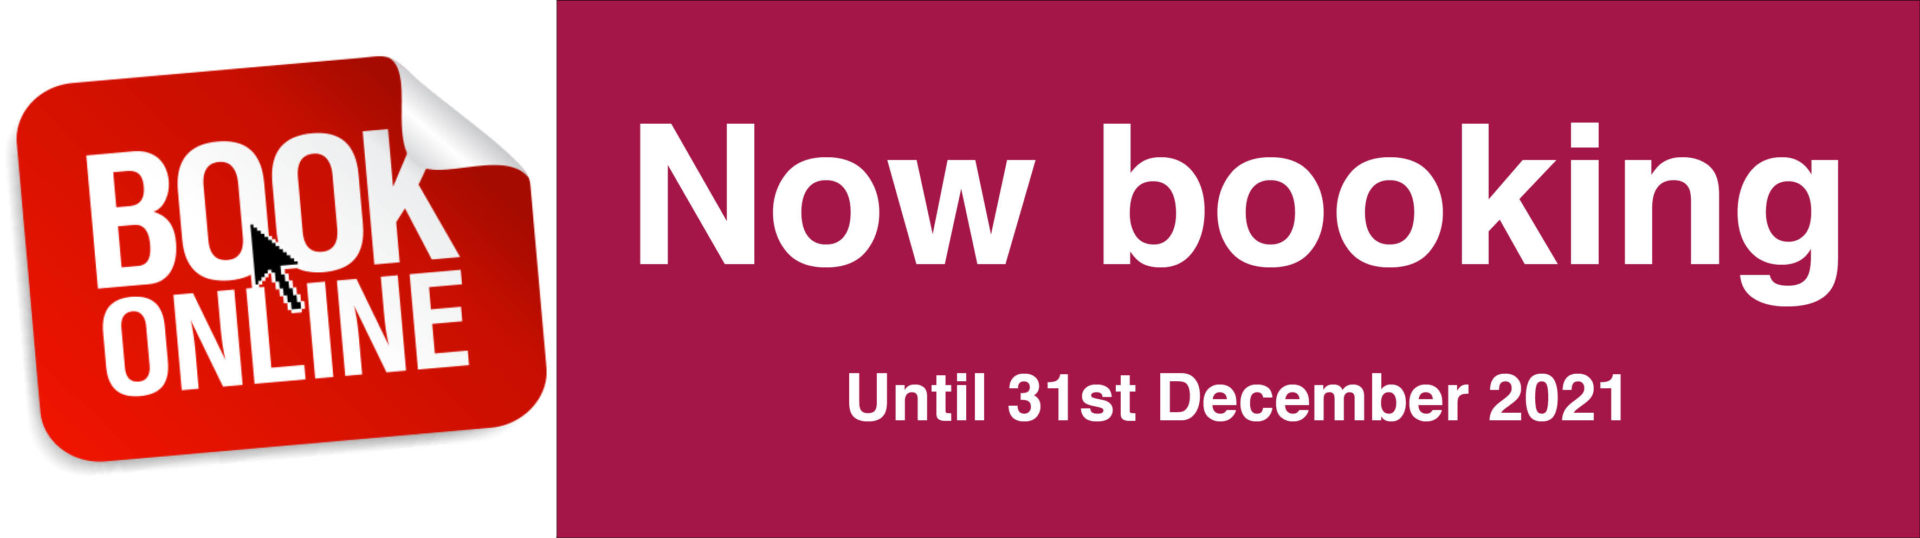 Now booking until December 2021